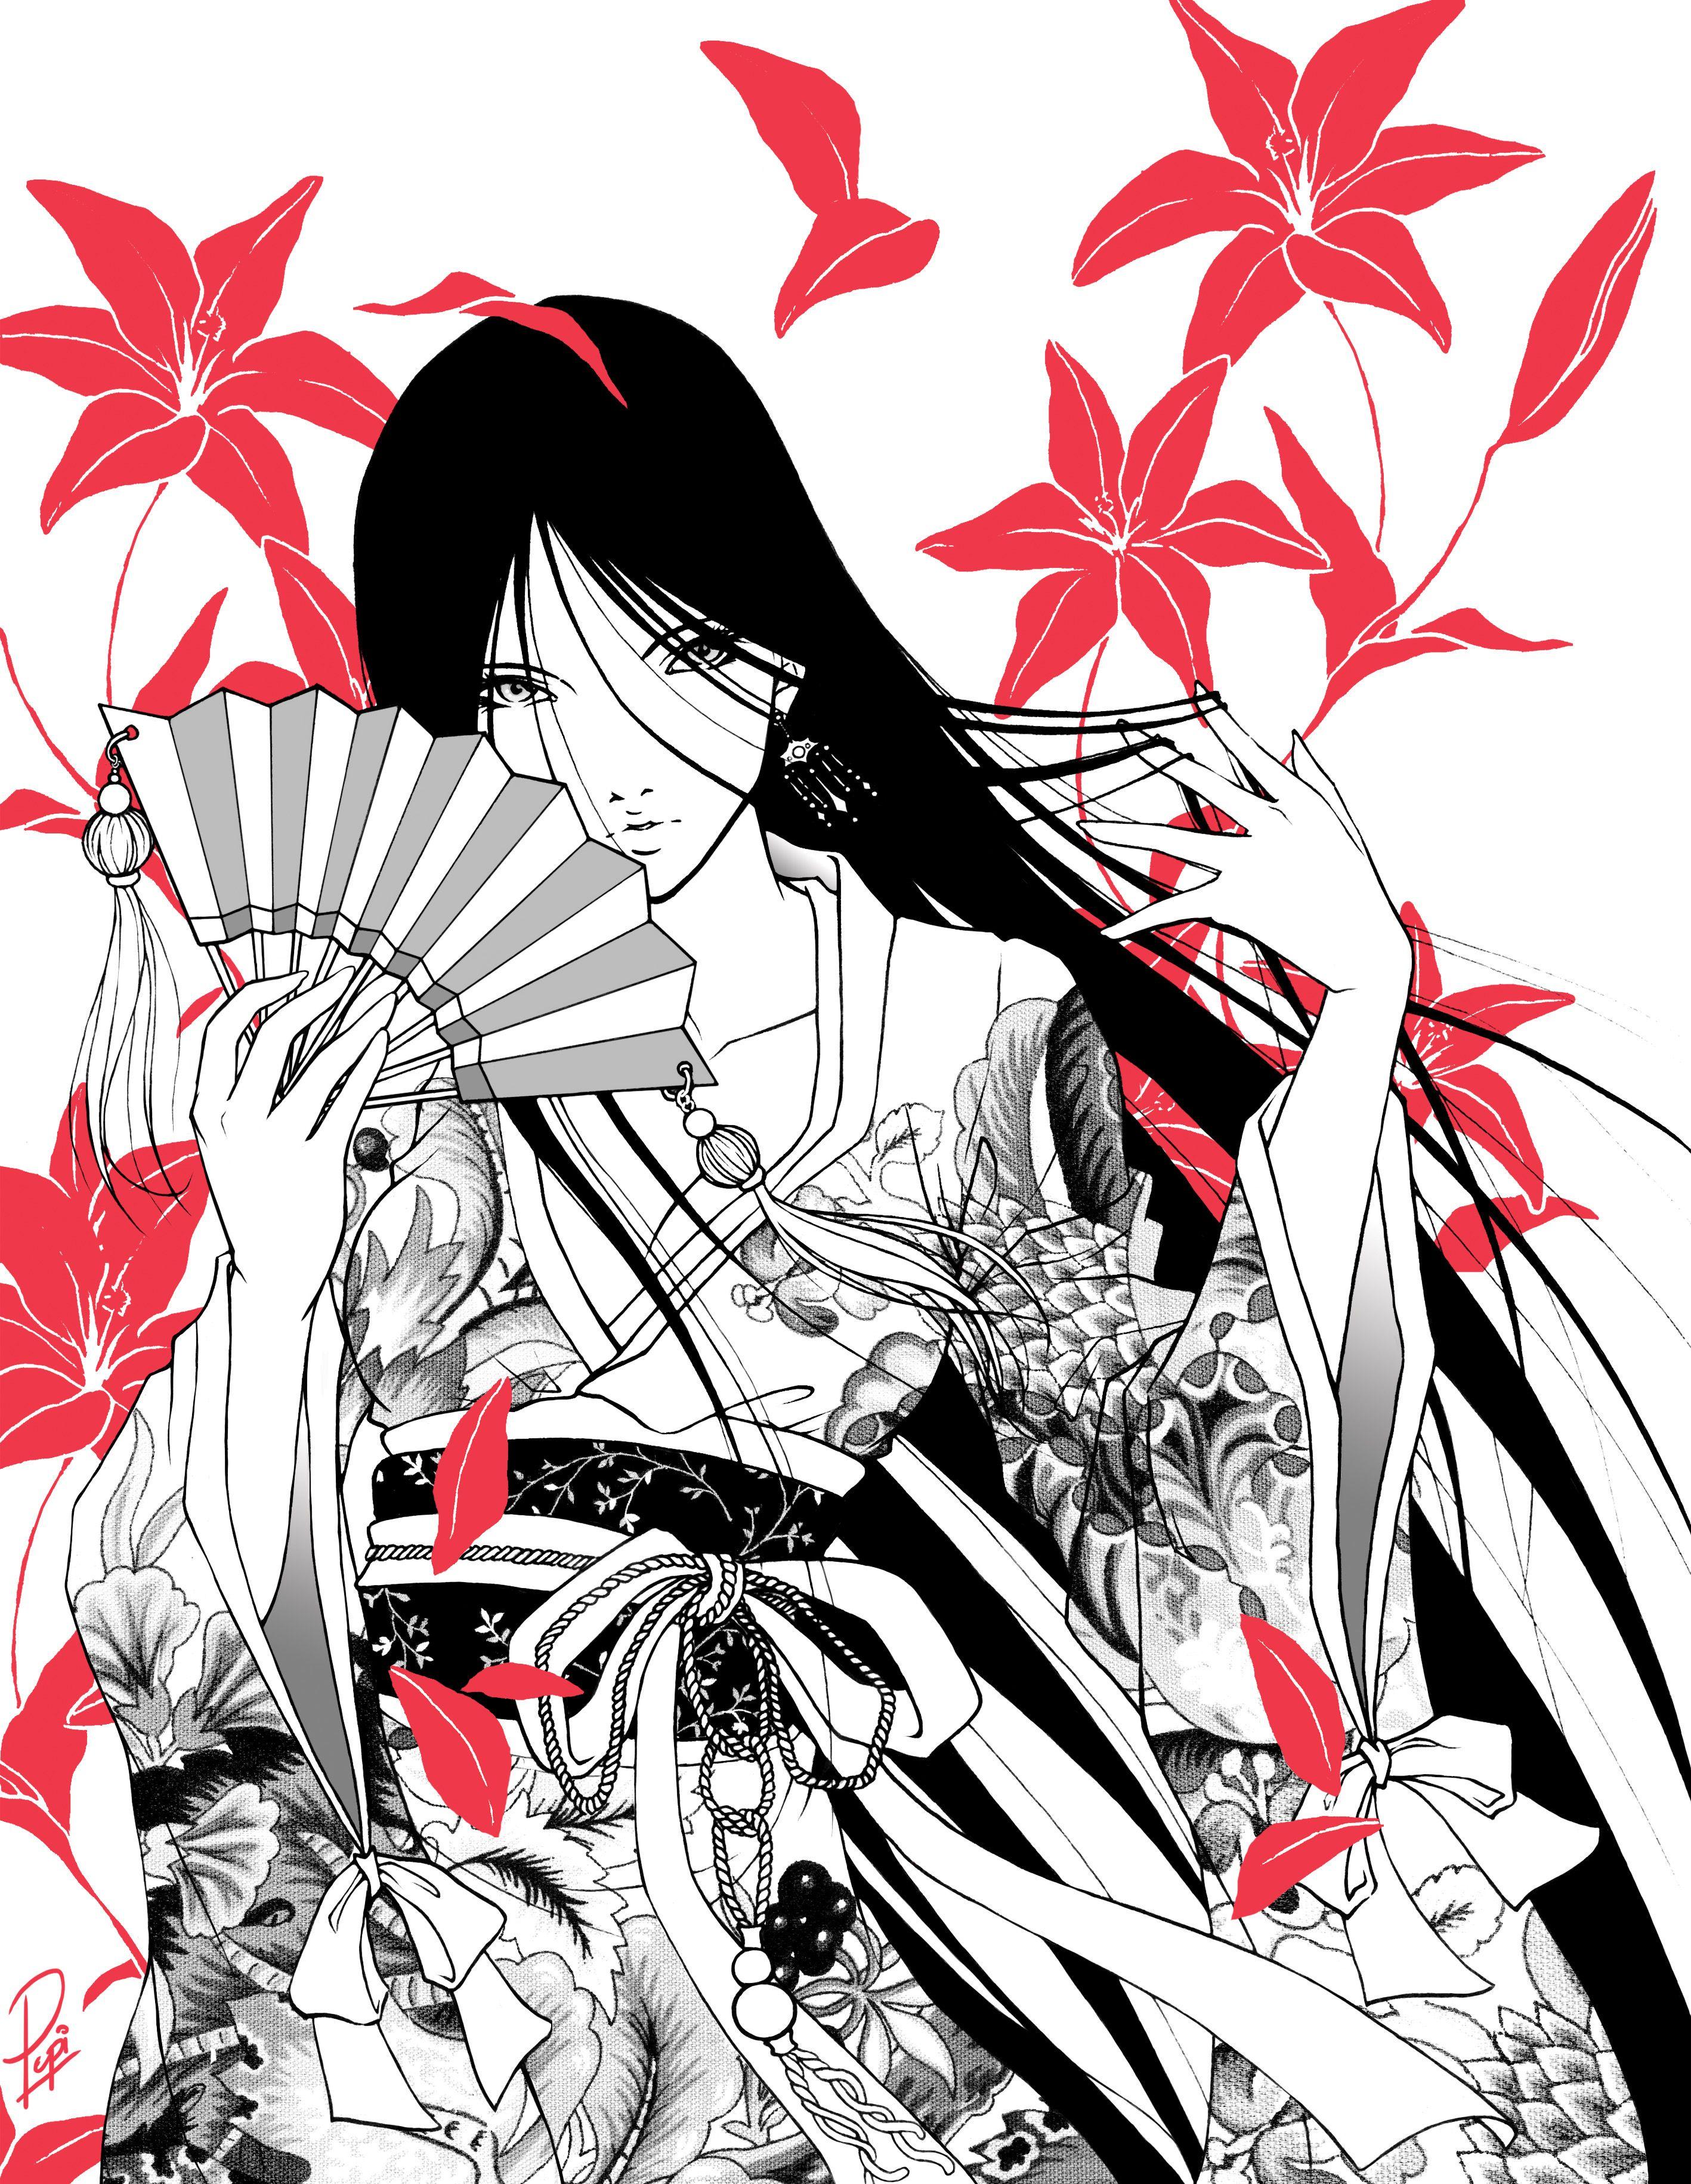 Gueixa geisha tattoo design geisha art japanese geisha japanese art japanese design